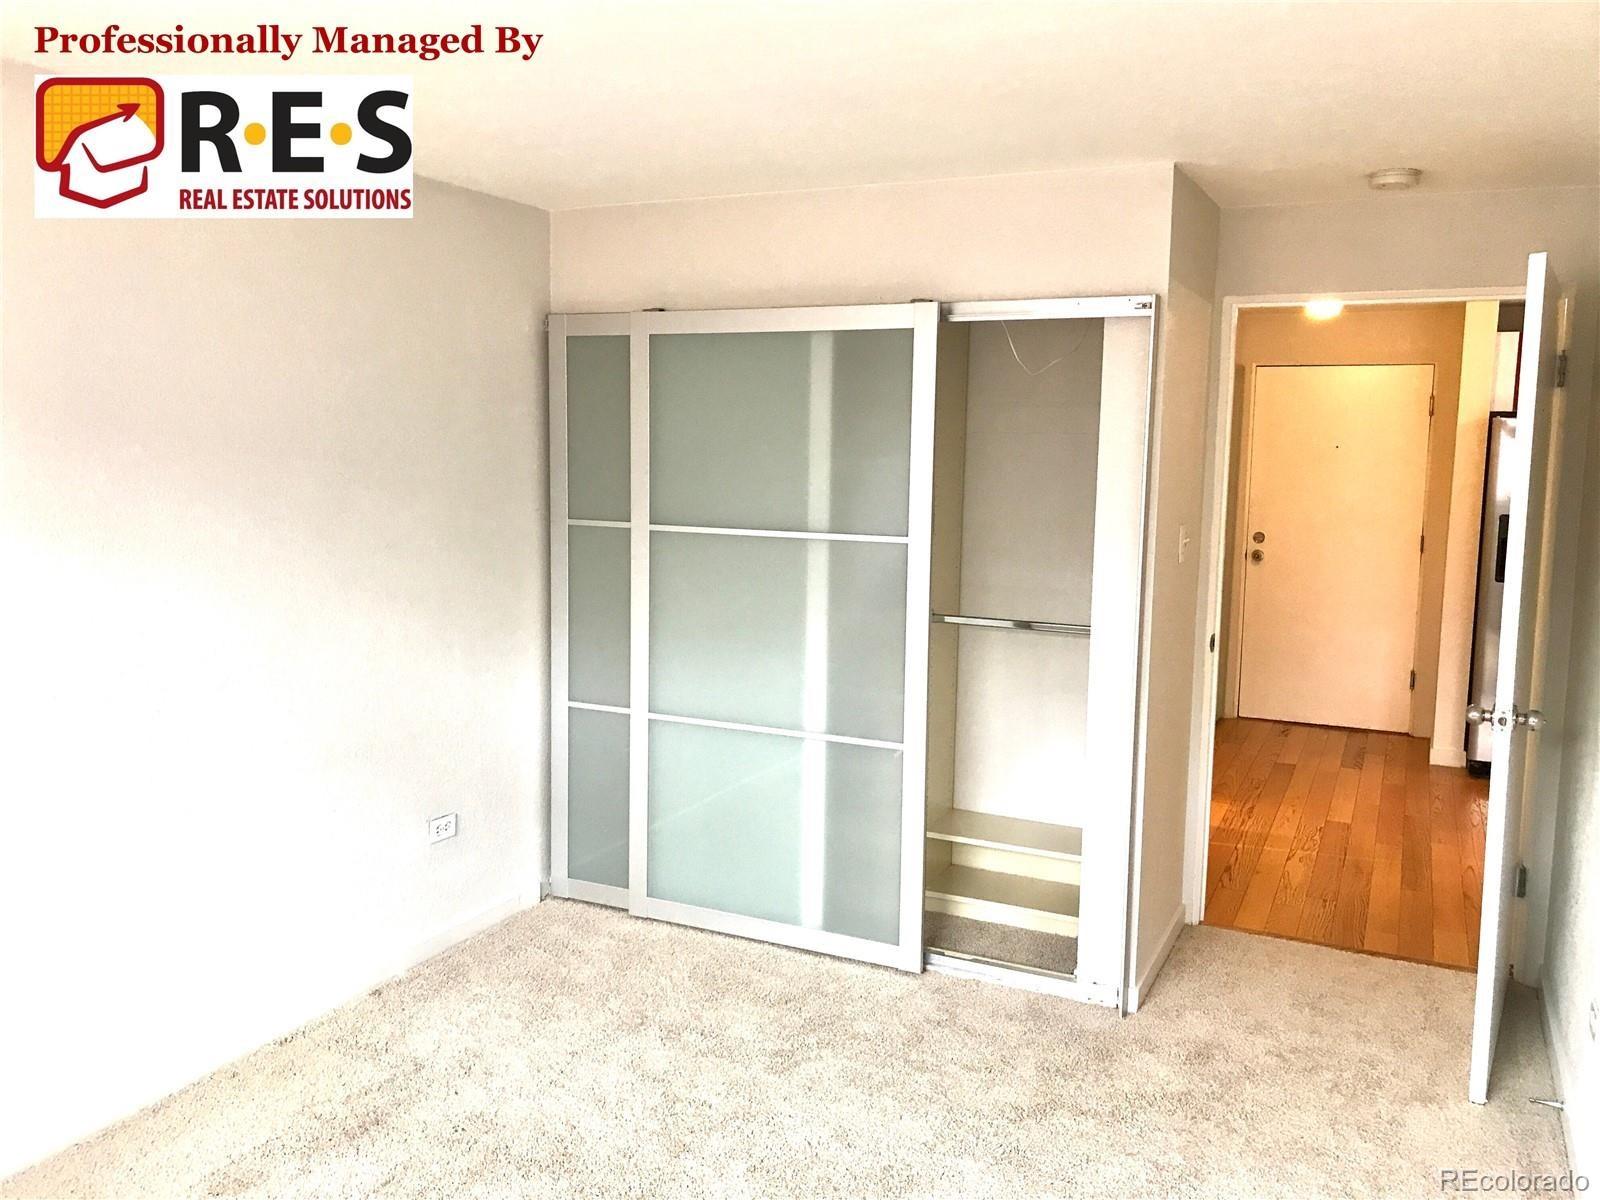 MLS# 9817838 - 8 - 75 N Emerson Street #103, Denver, CO 80218